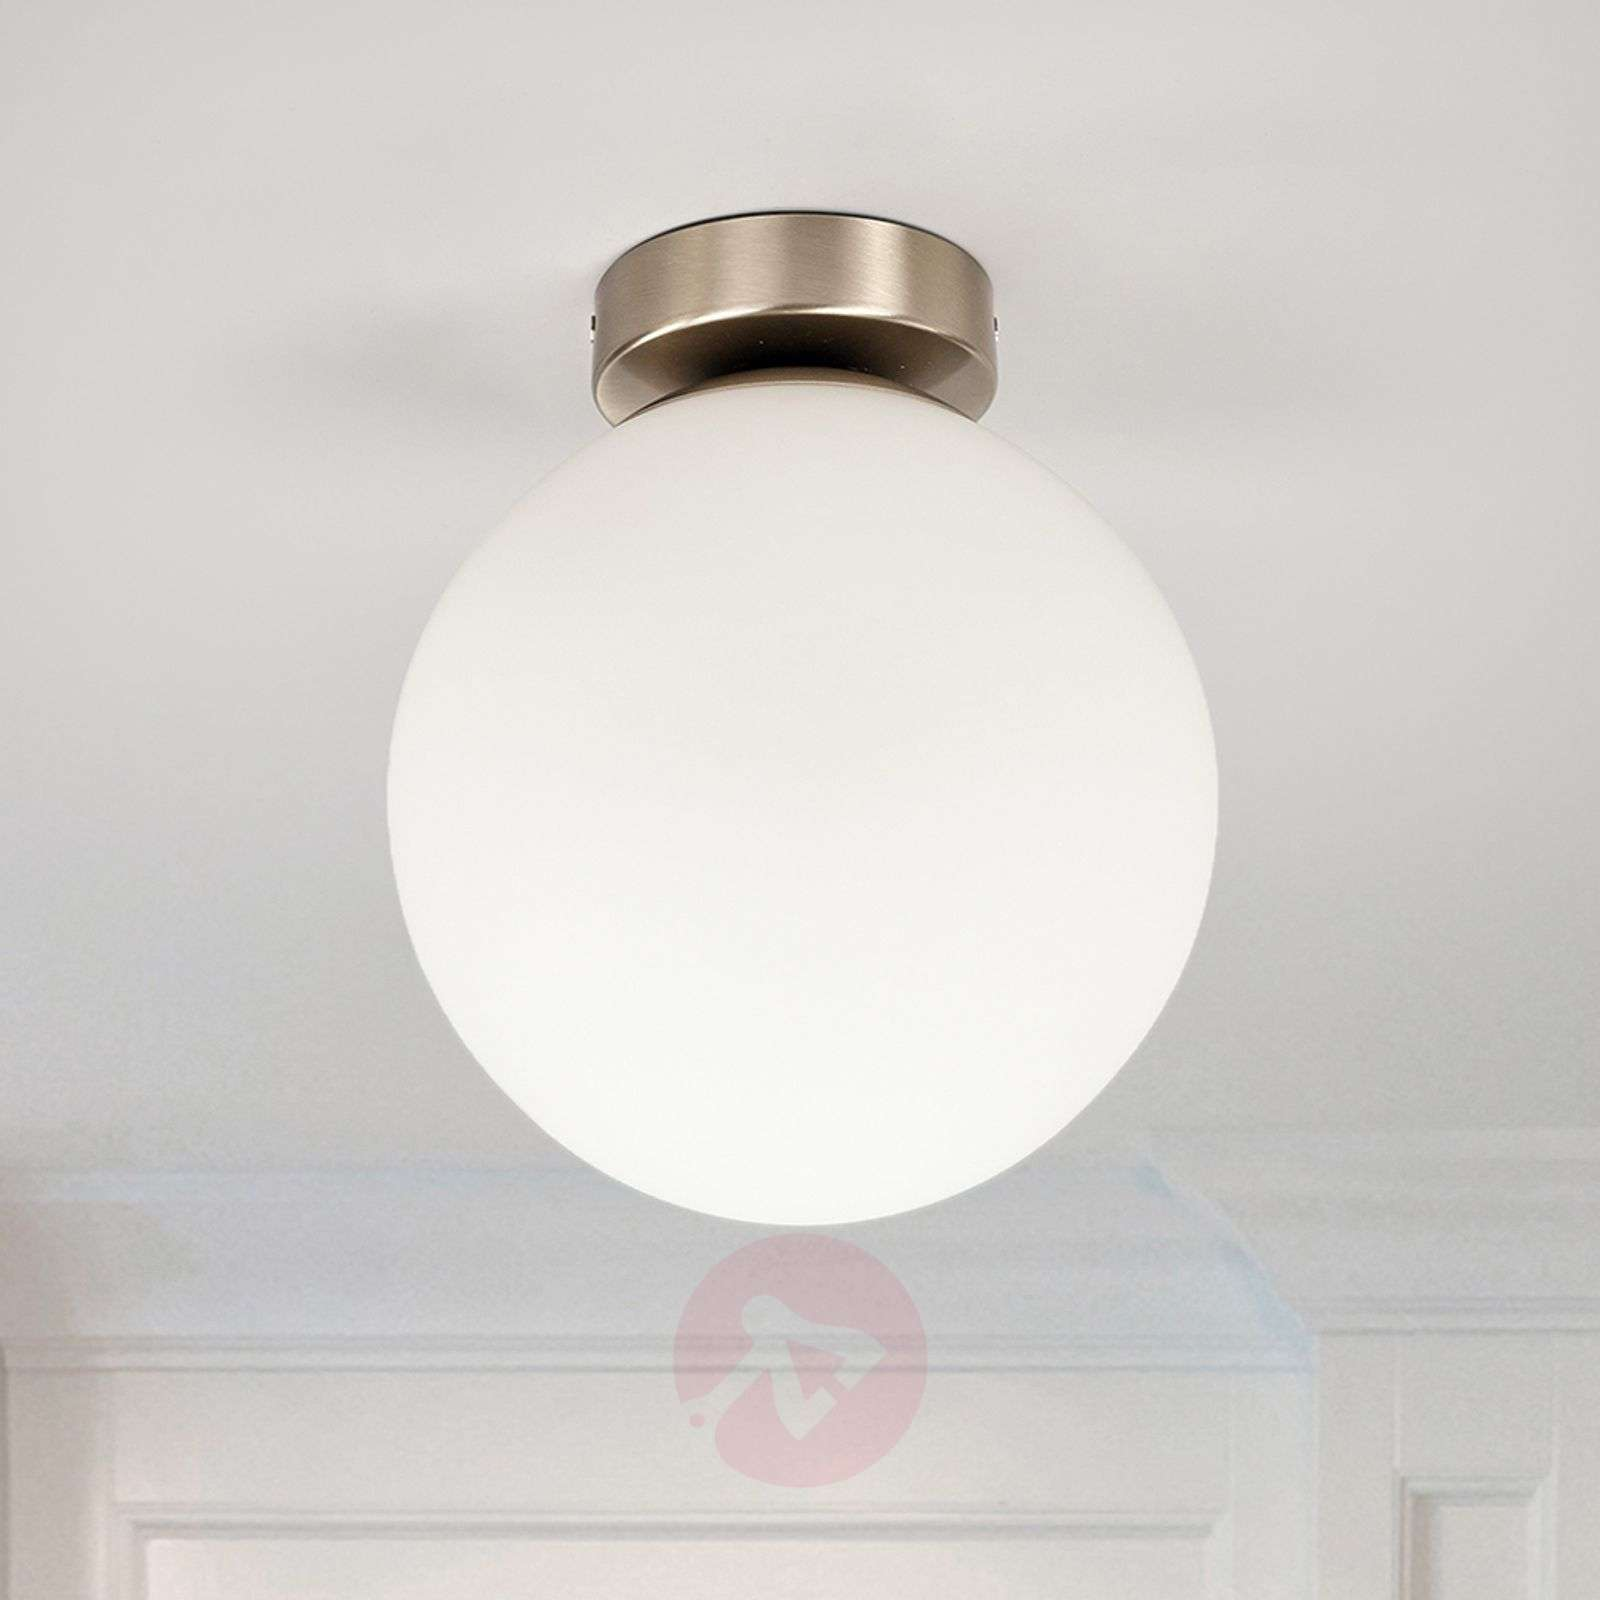 Round Bathroom Ceiling Light Lennie Lights Ie